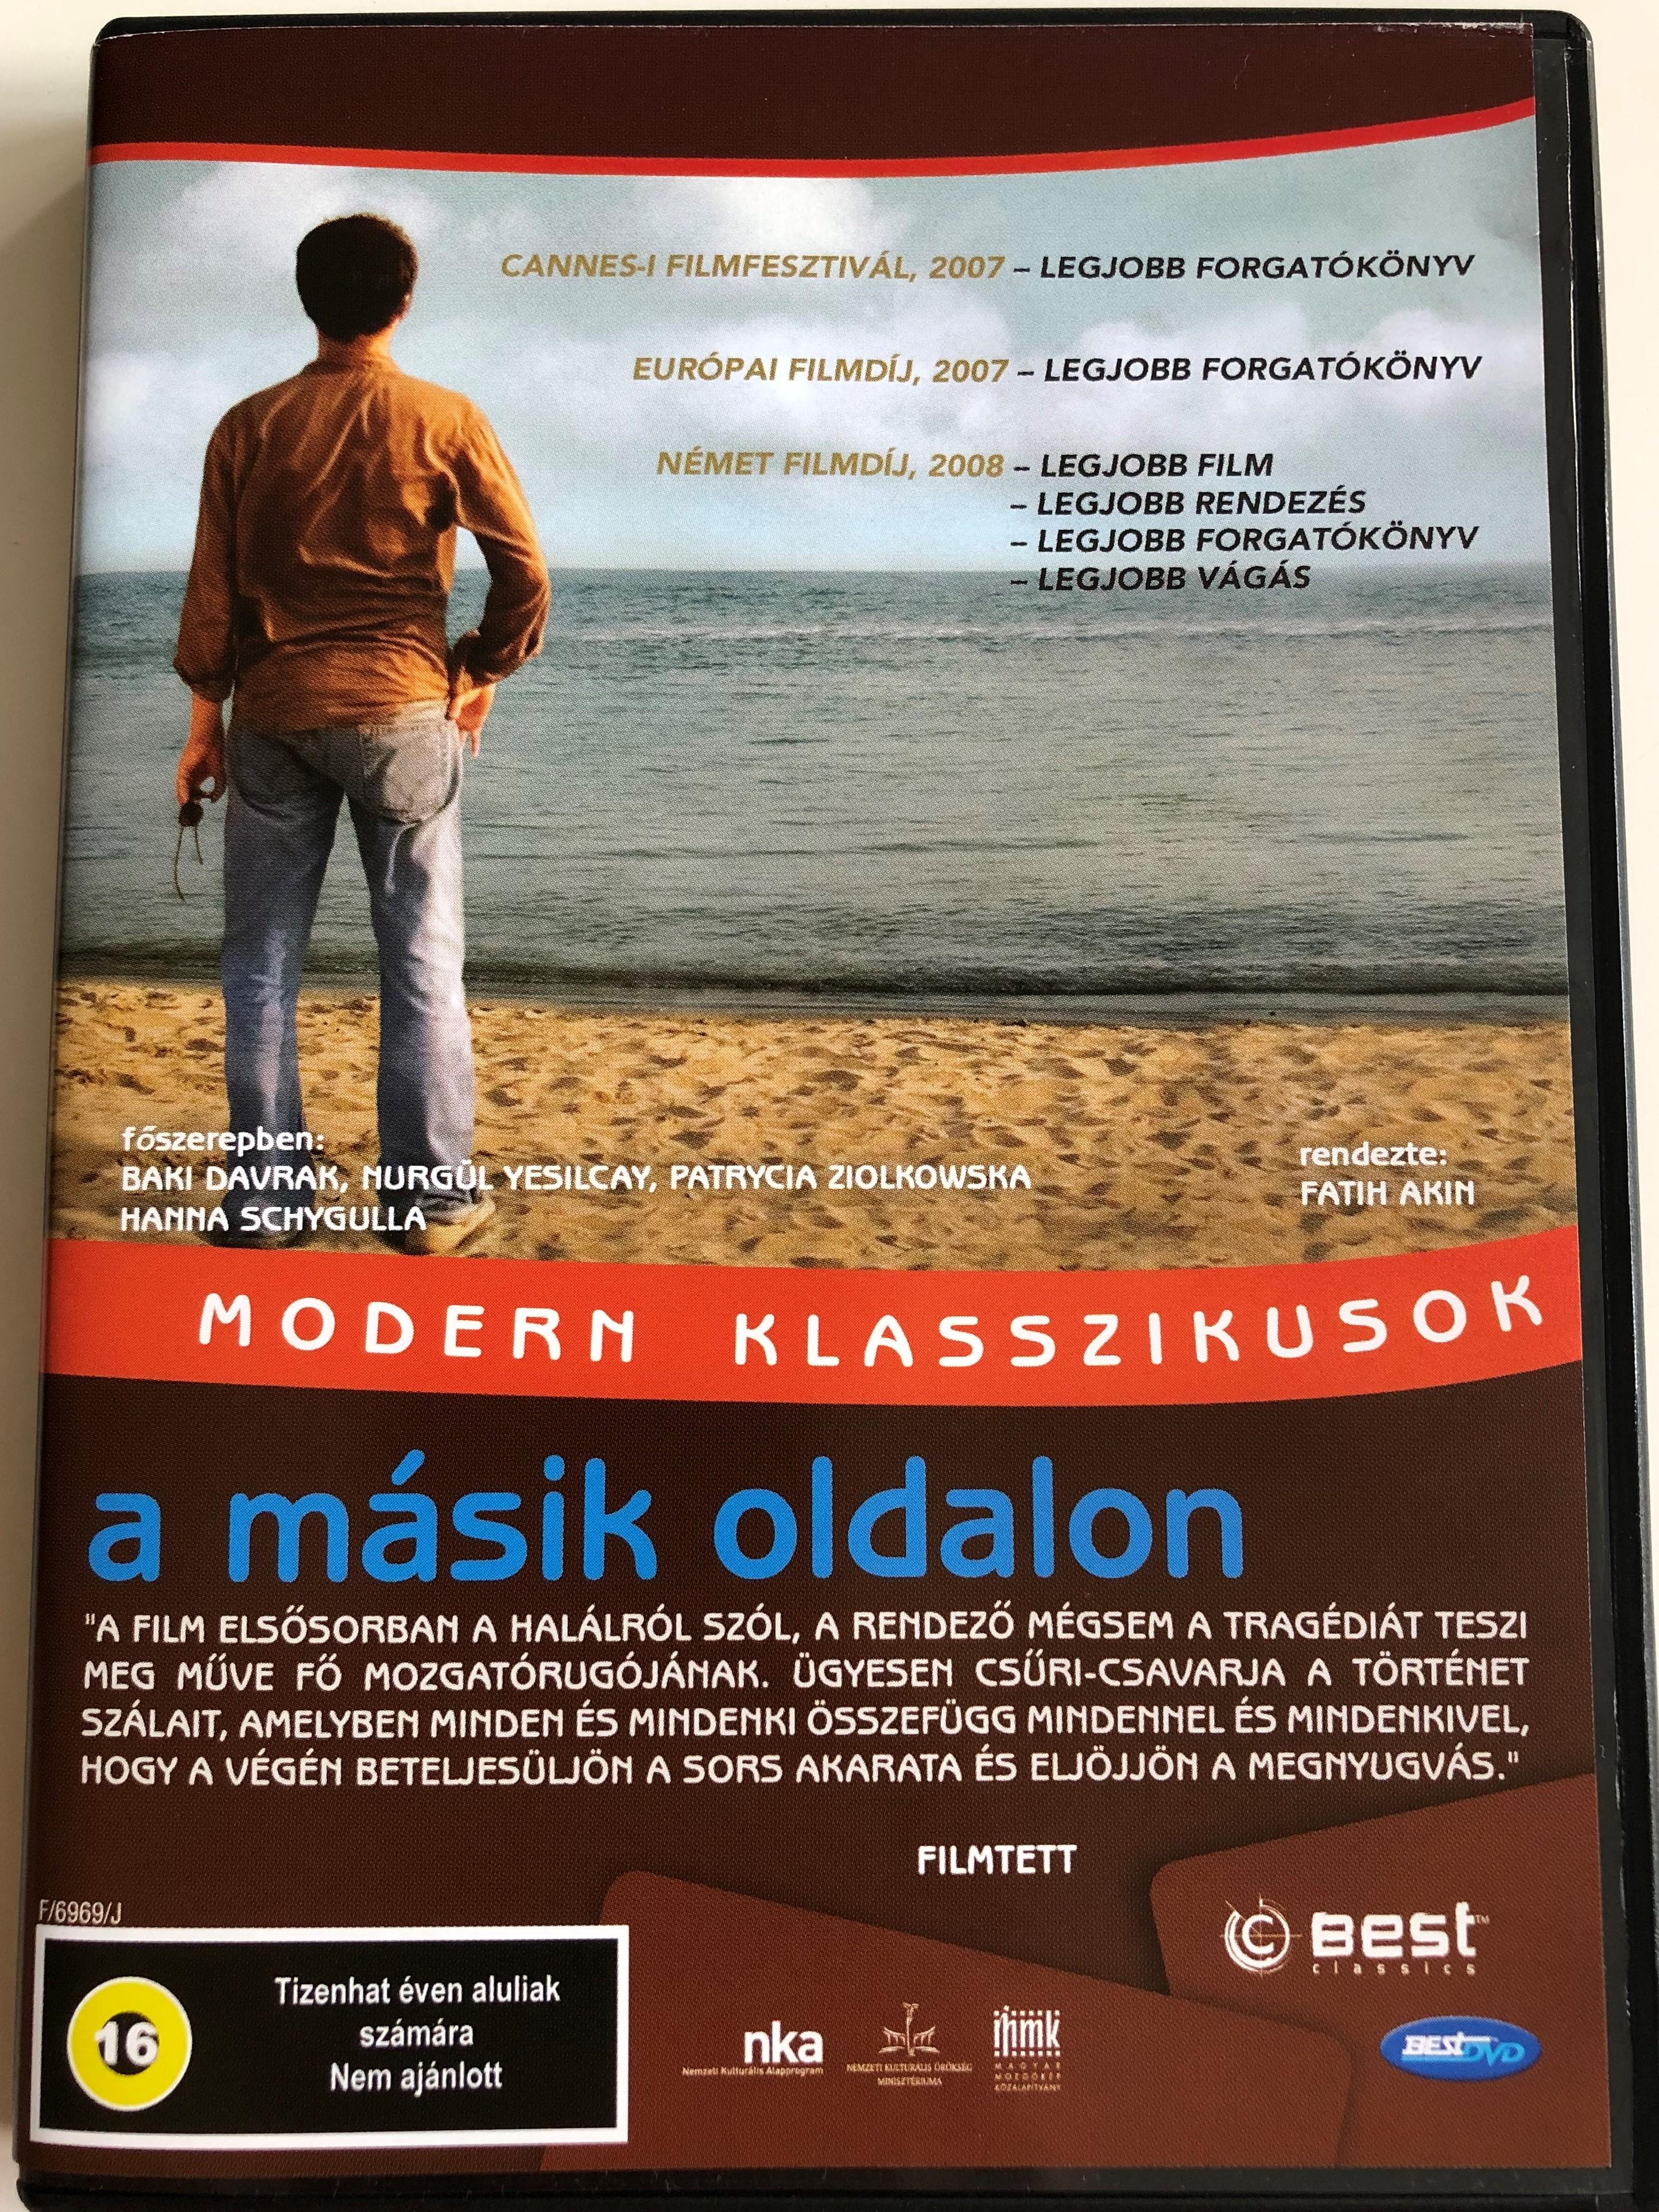 auf-der-anderen-seite-dvd-2007-a-m-sik-oldalon-the-edge-of-heaven-directed-by-fatih-ak-n-starring-baki-davrak-murg-l-yesilcay-patrycia-ziolkowska-hanna-schygulla-1-.jpg